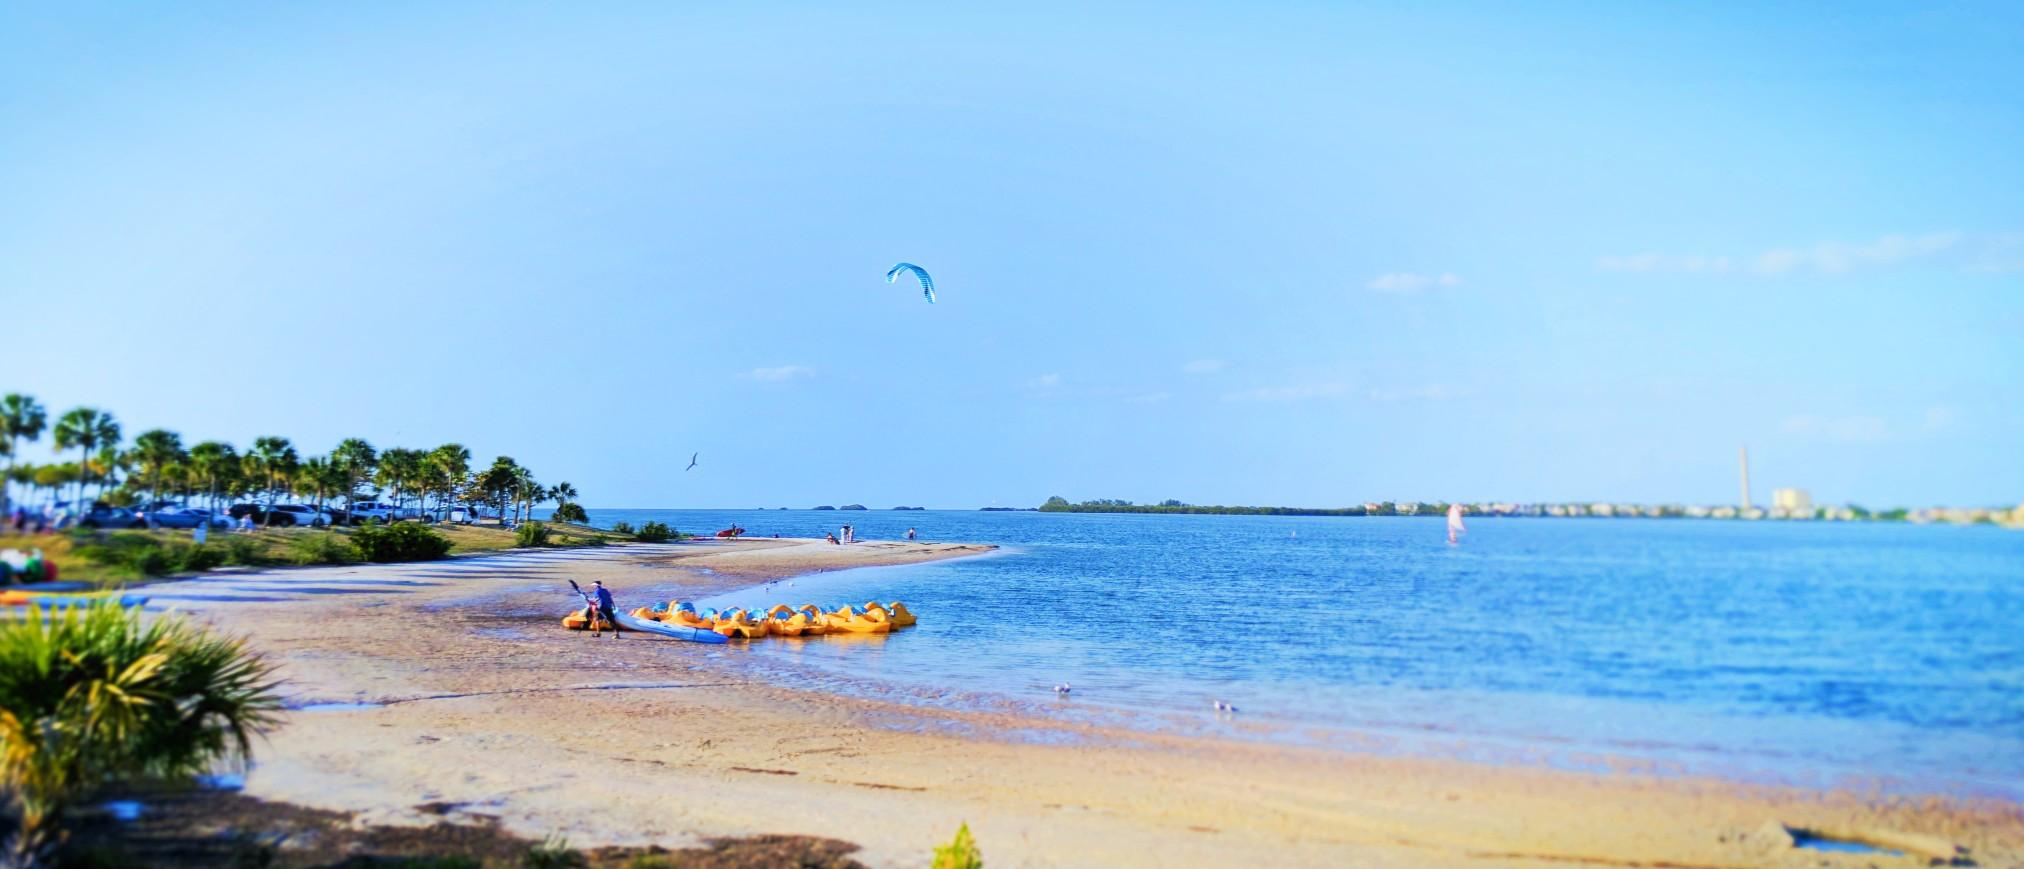 Kayak Rentals at Beach in Tarpon Springs Florida 1